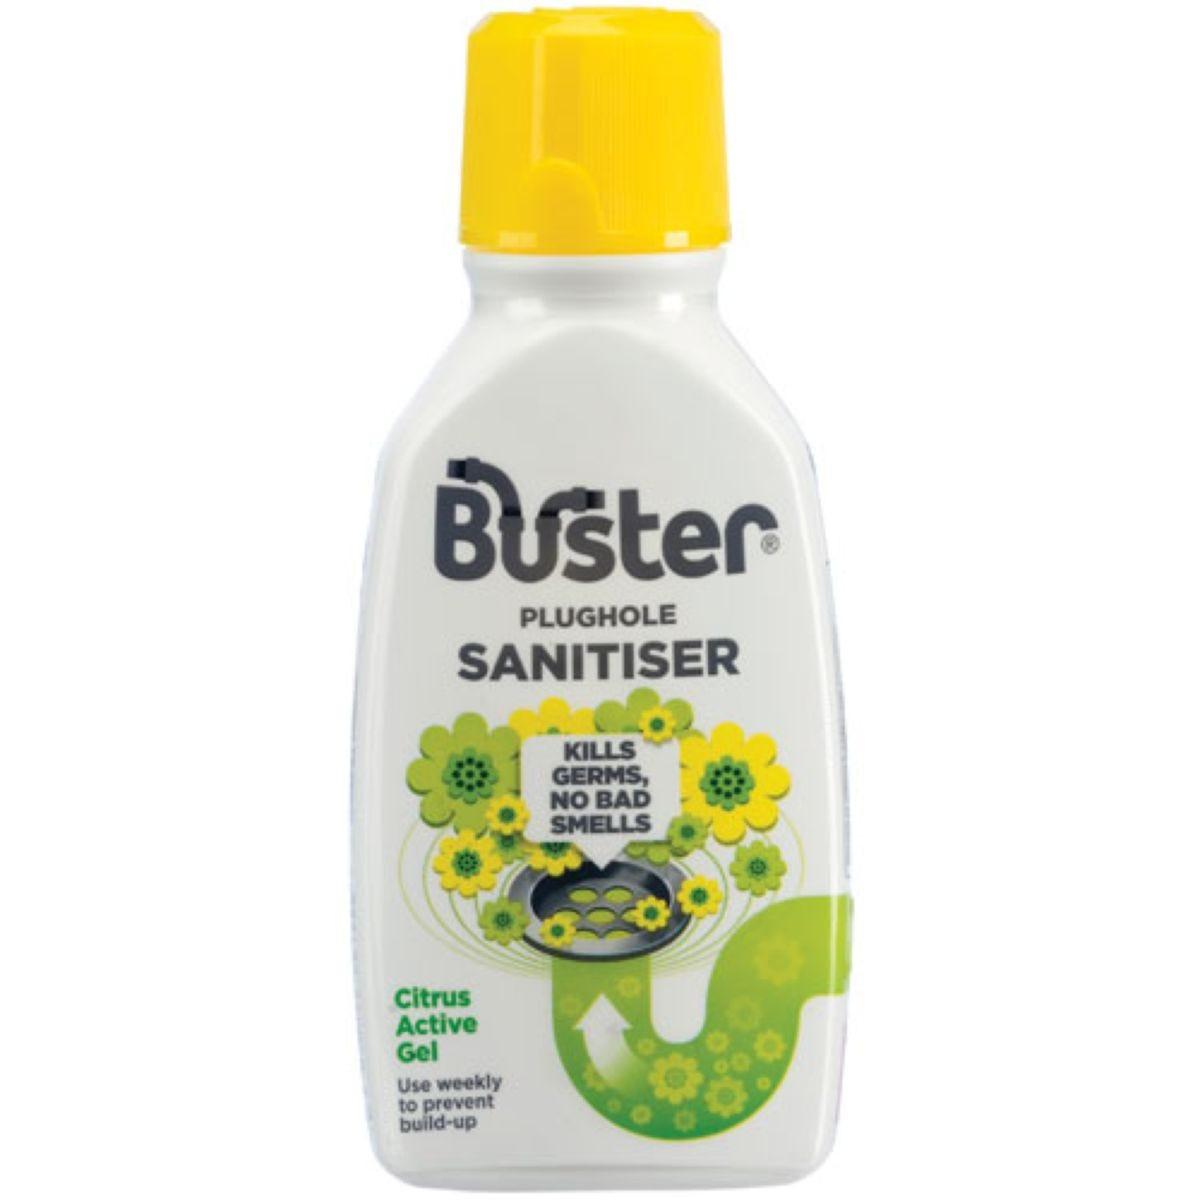 Buster Plughole Sanitiser Gel - 300ml